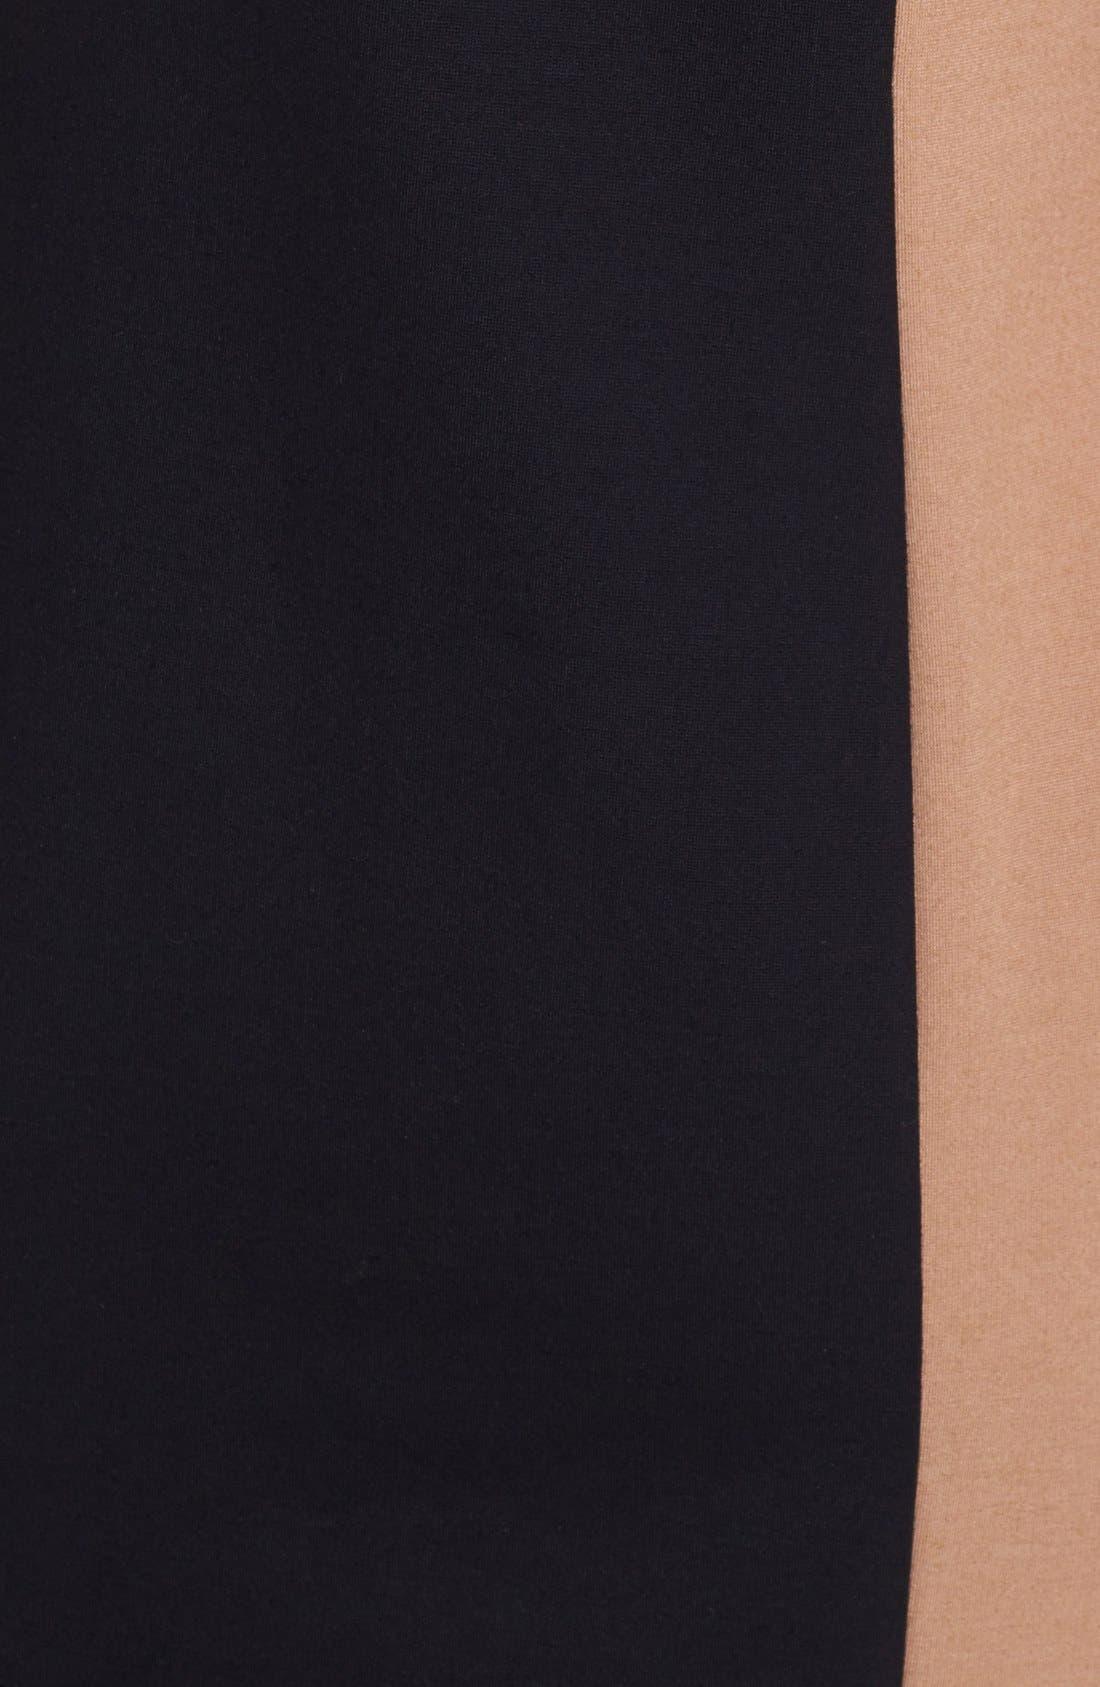 Alternate Image 3  - Kenneth Cole New York 'Hulda' Zip Colorblock Dress